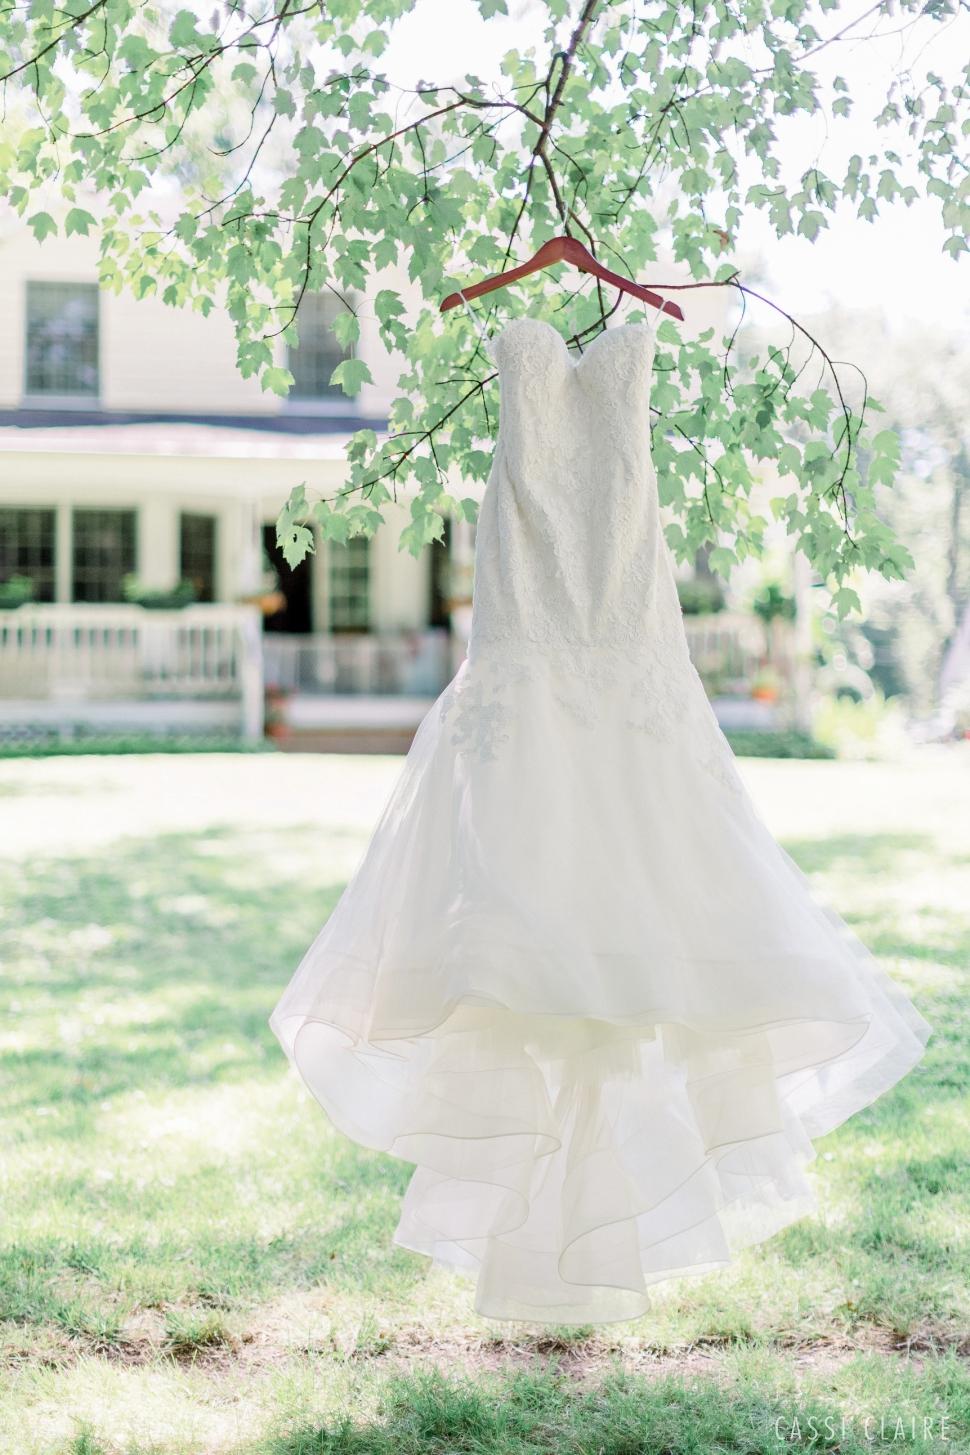 Canoe-Brook-Country-Club-New-Jersey-Wedding-Photographer_01.jpg